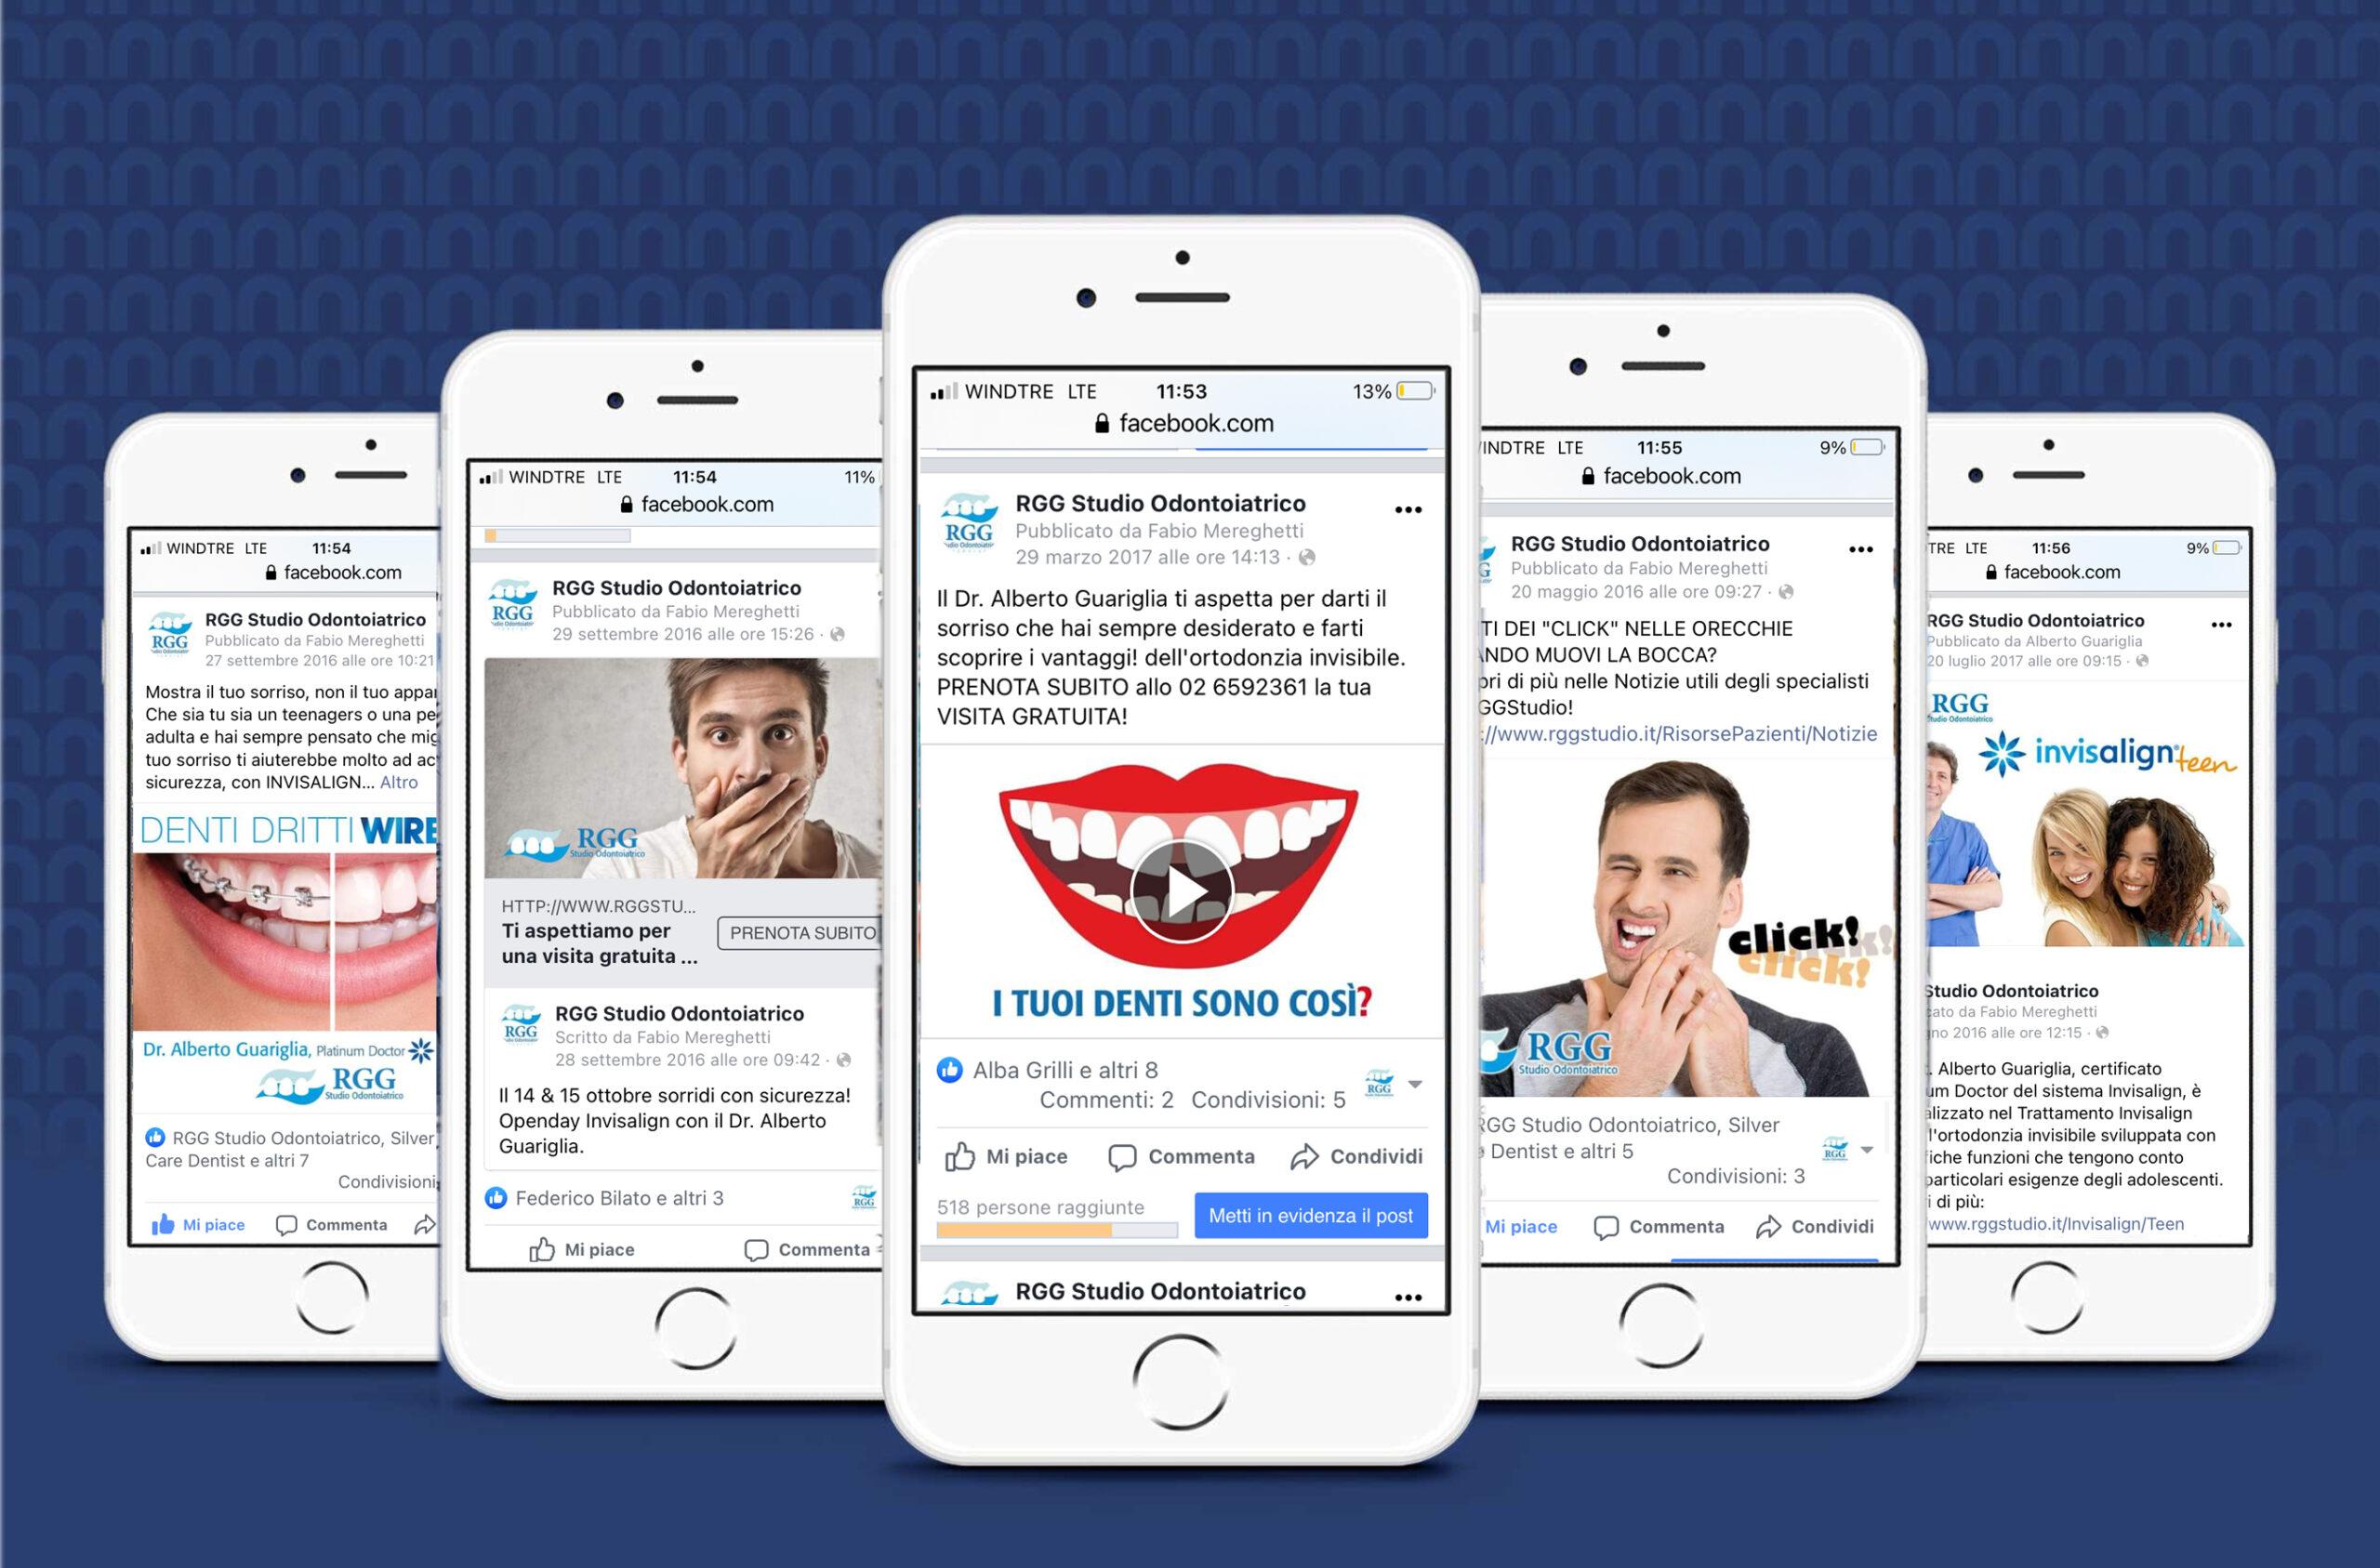 RGG Studio Odontoiatrico: Social campaign